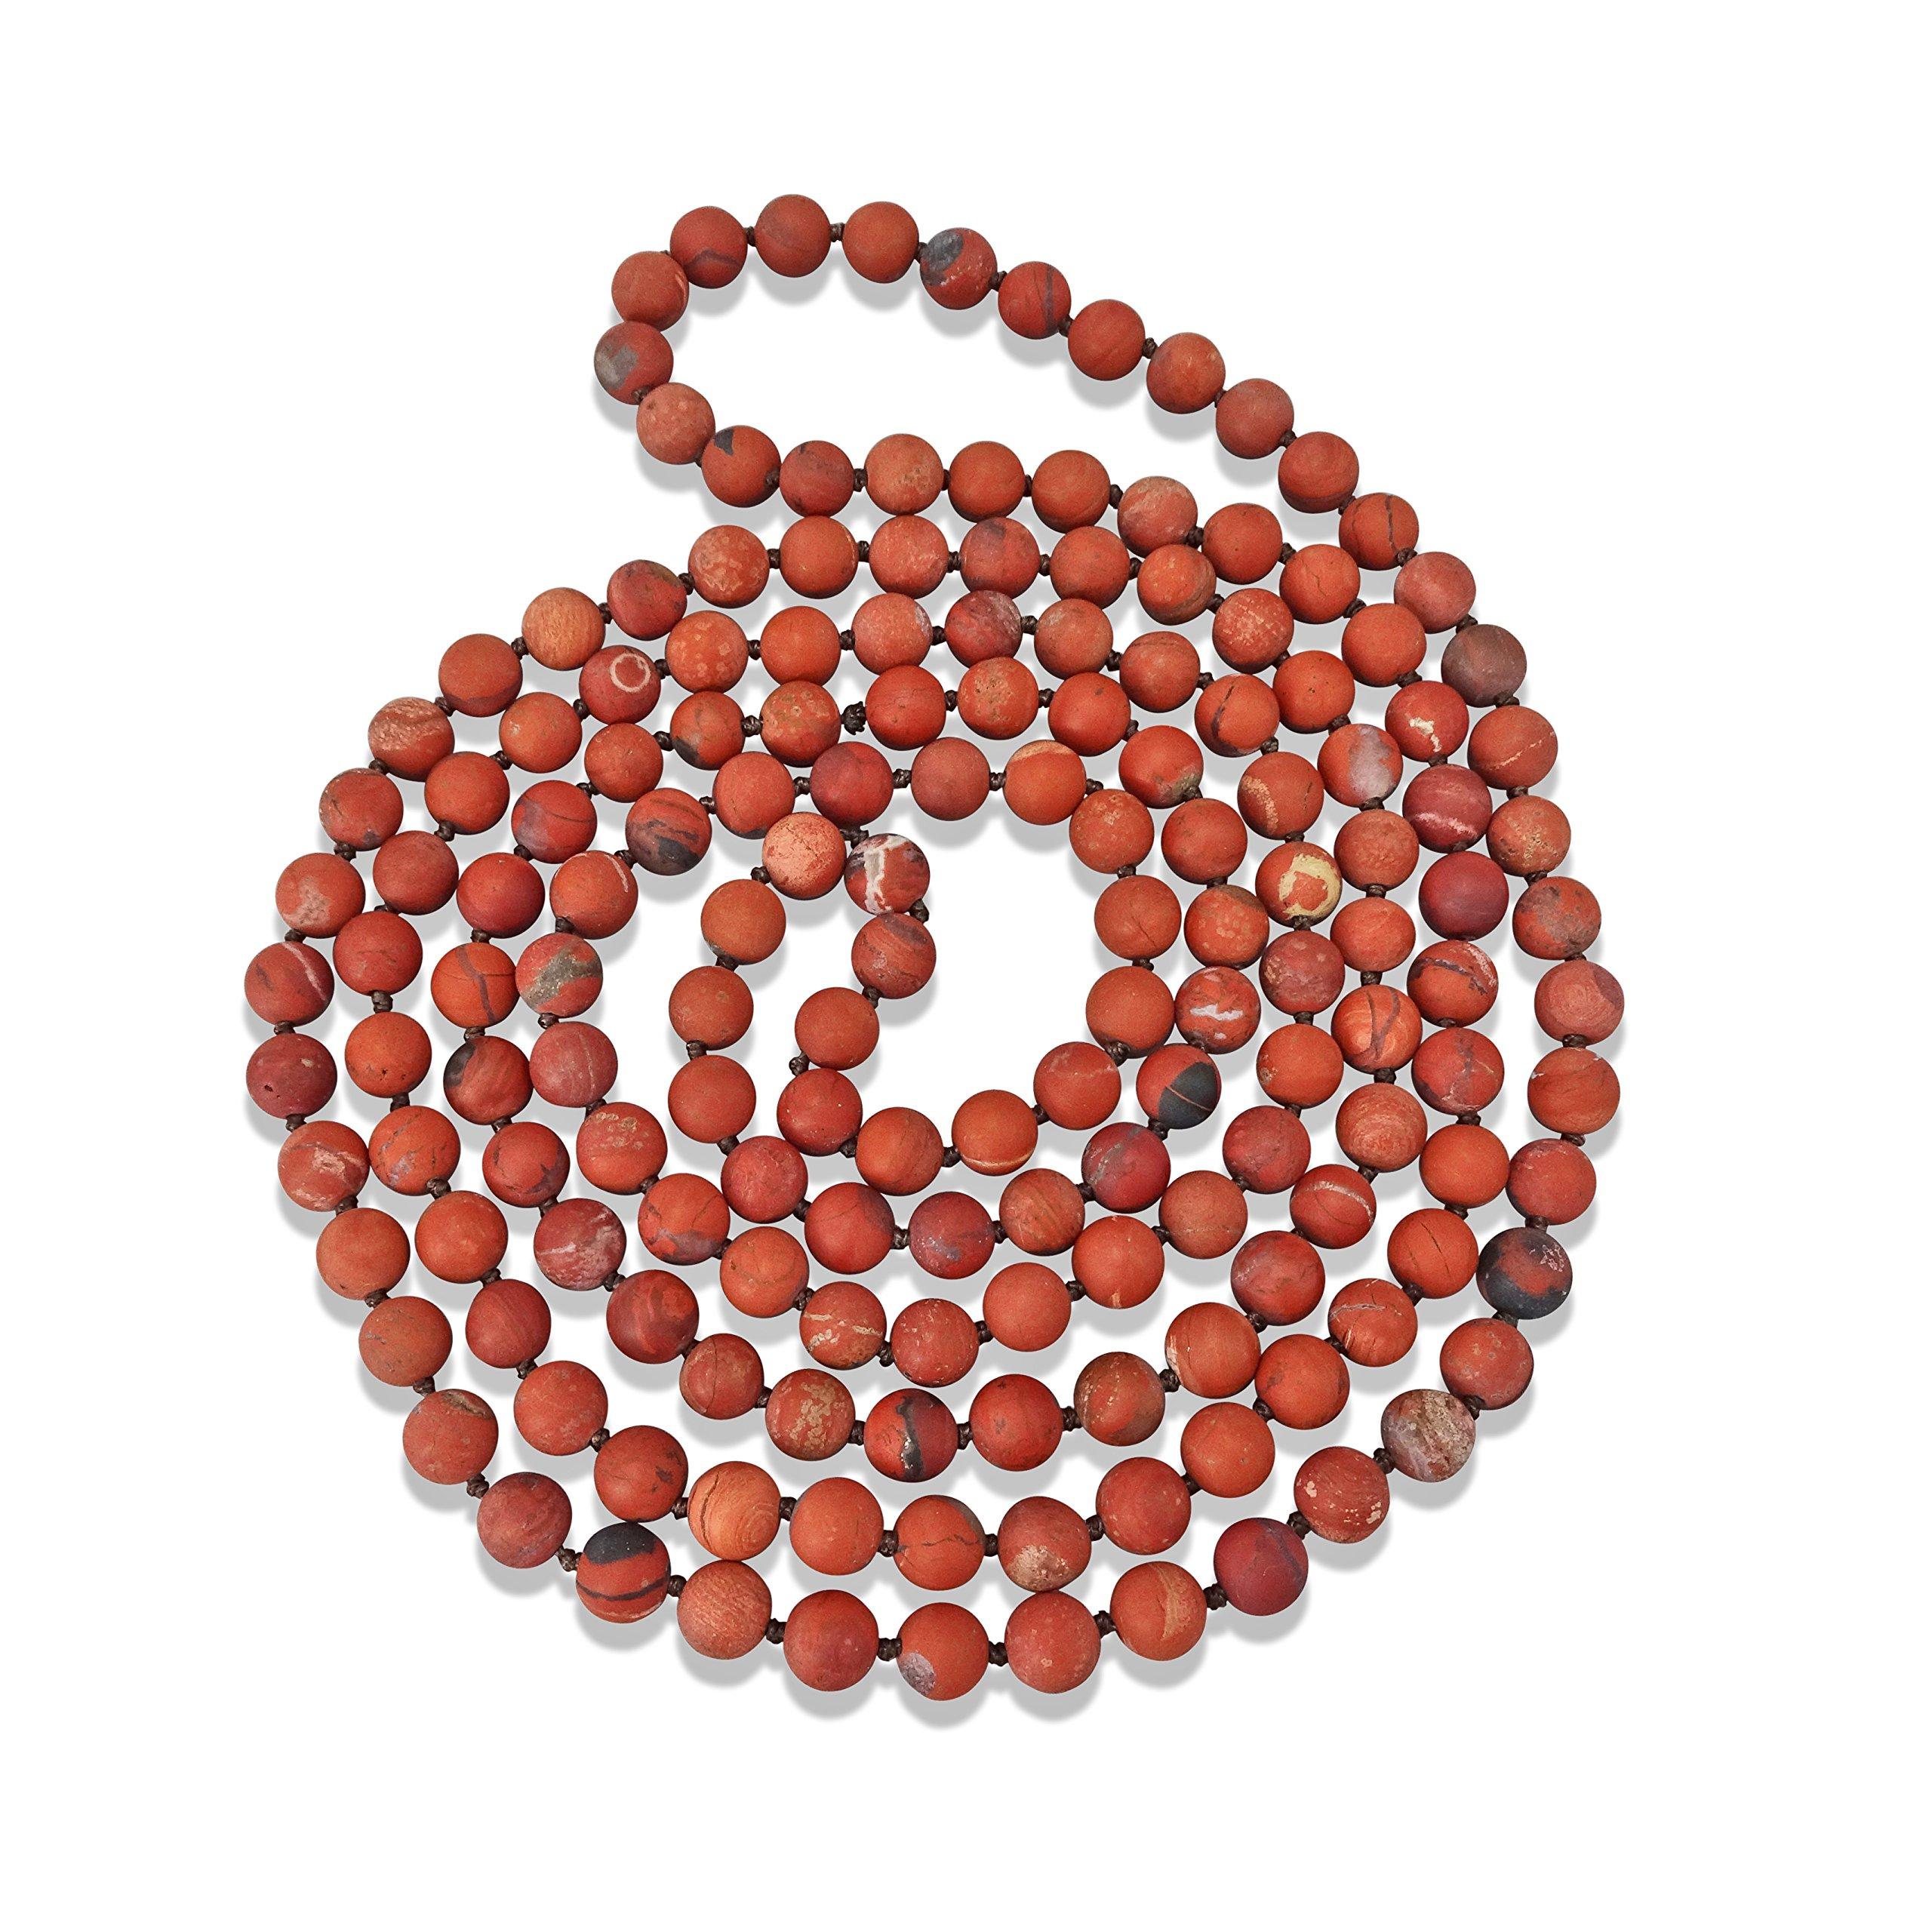 BjB Endless Infinity Style 8MM Semi-precious Genuine Red Jasper Stone Beaded Necklace, 60'' Long.